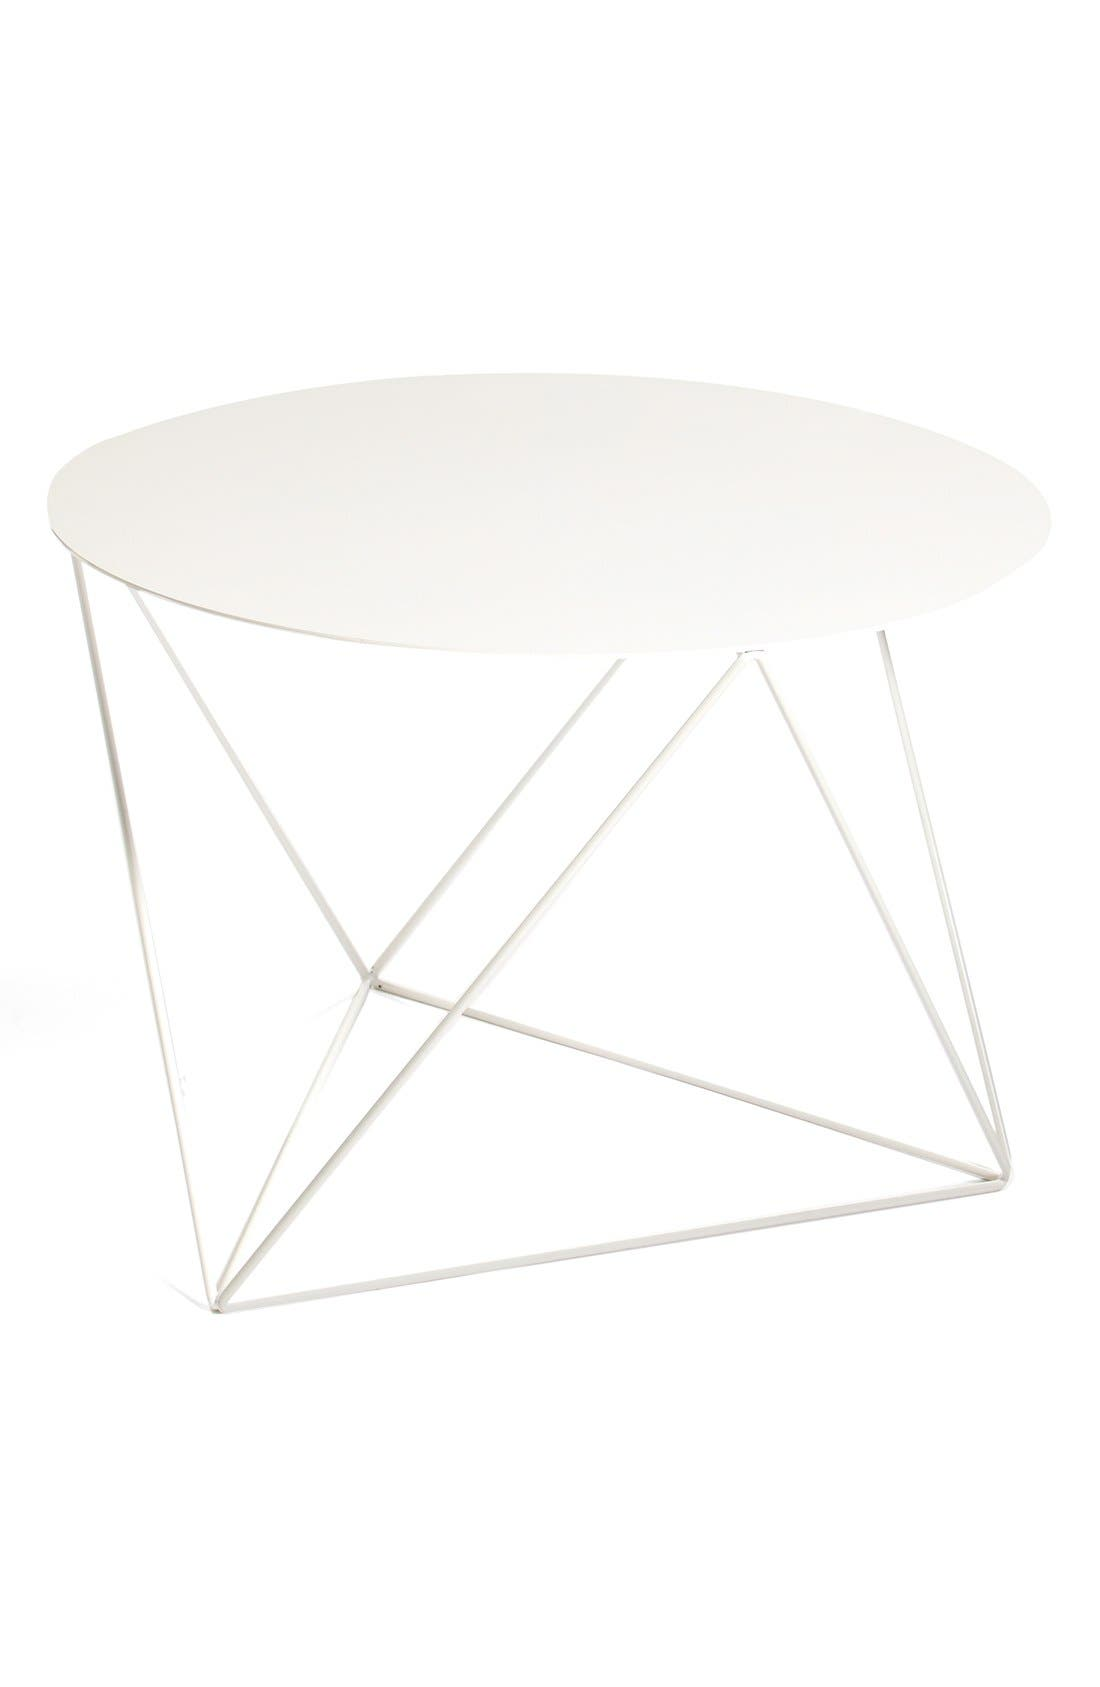 ERIC TRINE,                             Octahedron Side Table,                             Main thumbnail 1, color,                             100